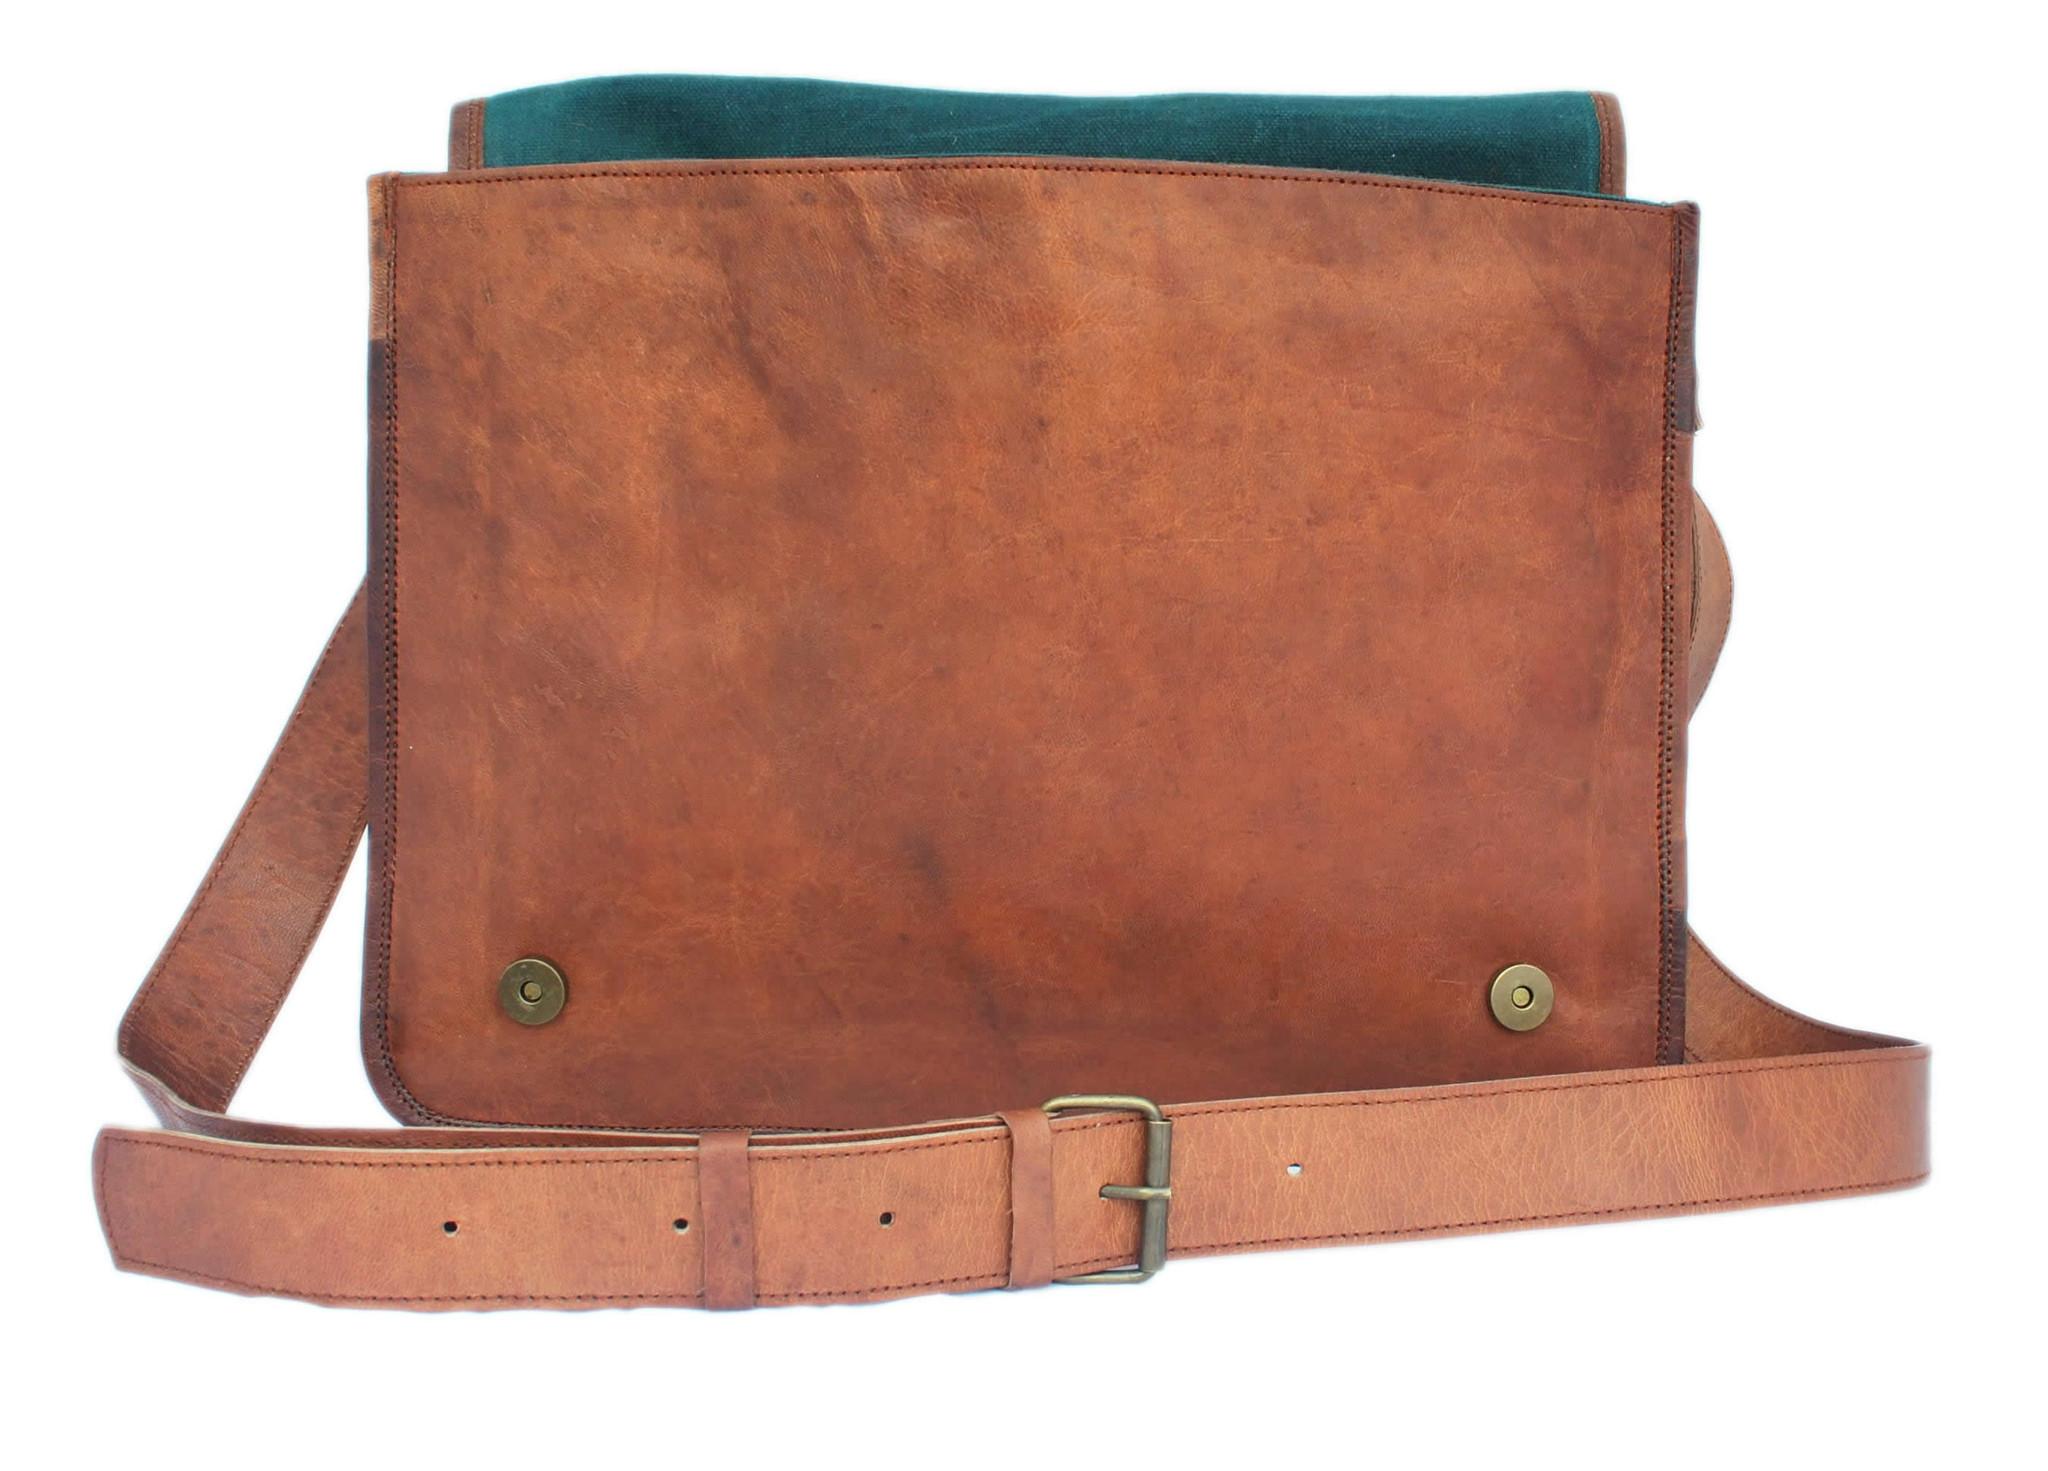 Backpack Messenger Bag Leather- Fenix Toulouse Handball d171de8607955